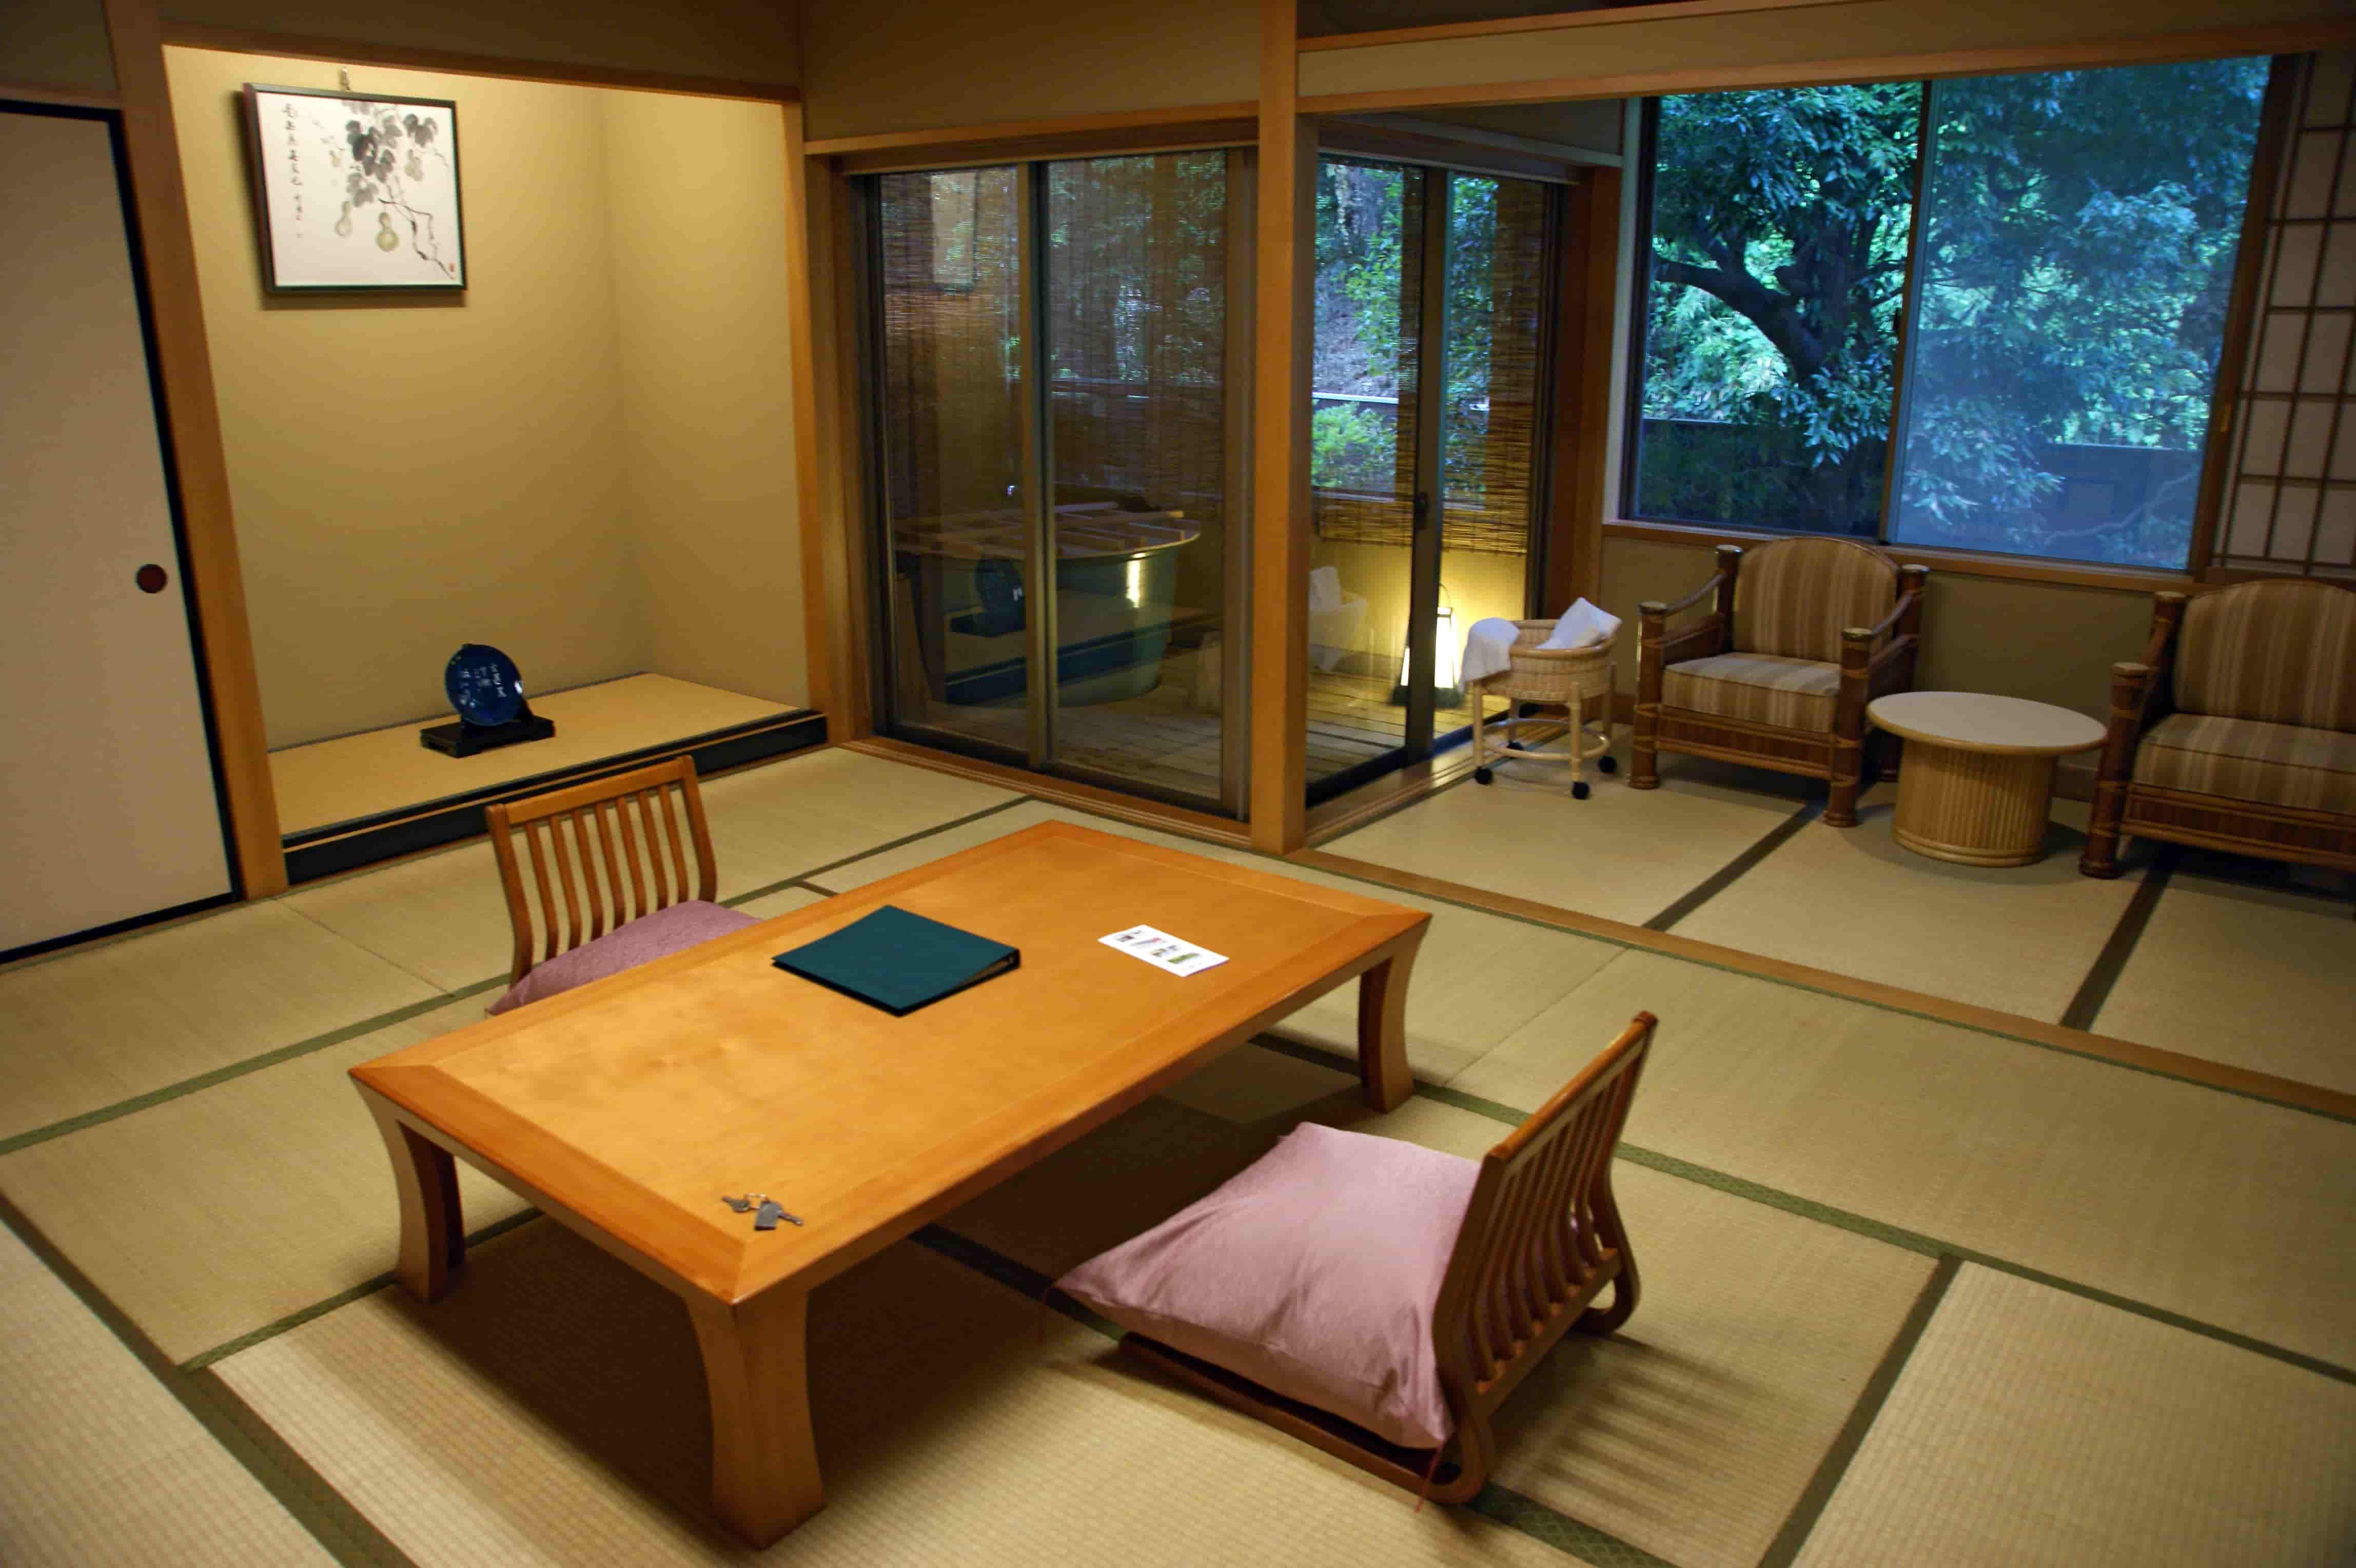 ryokan accommodations in japan